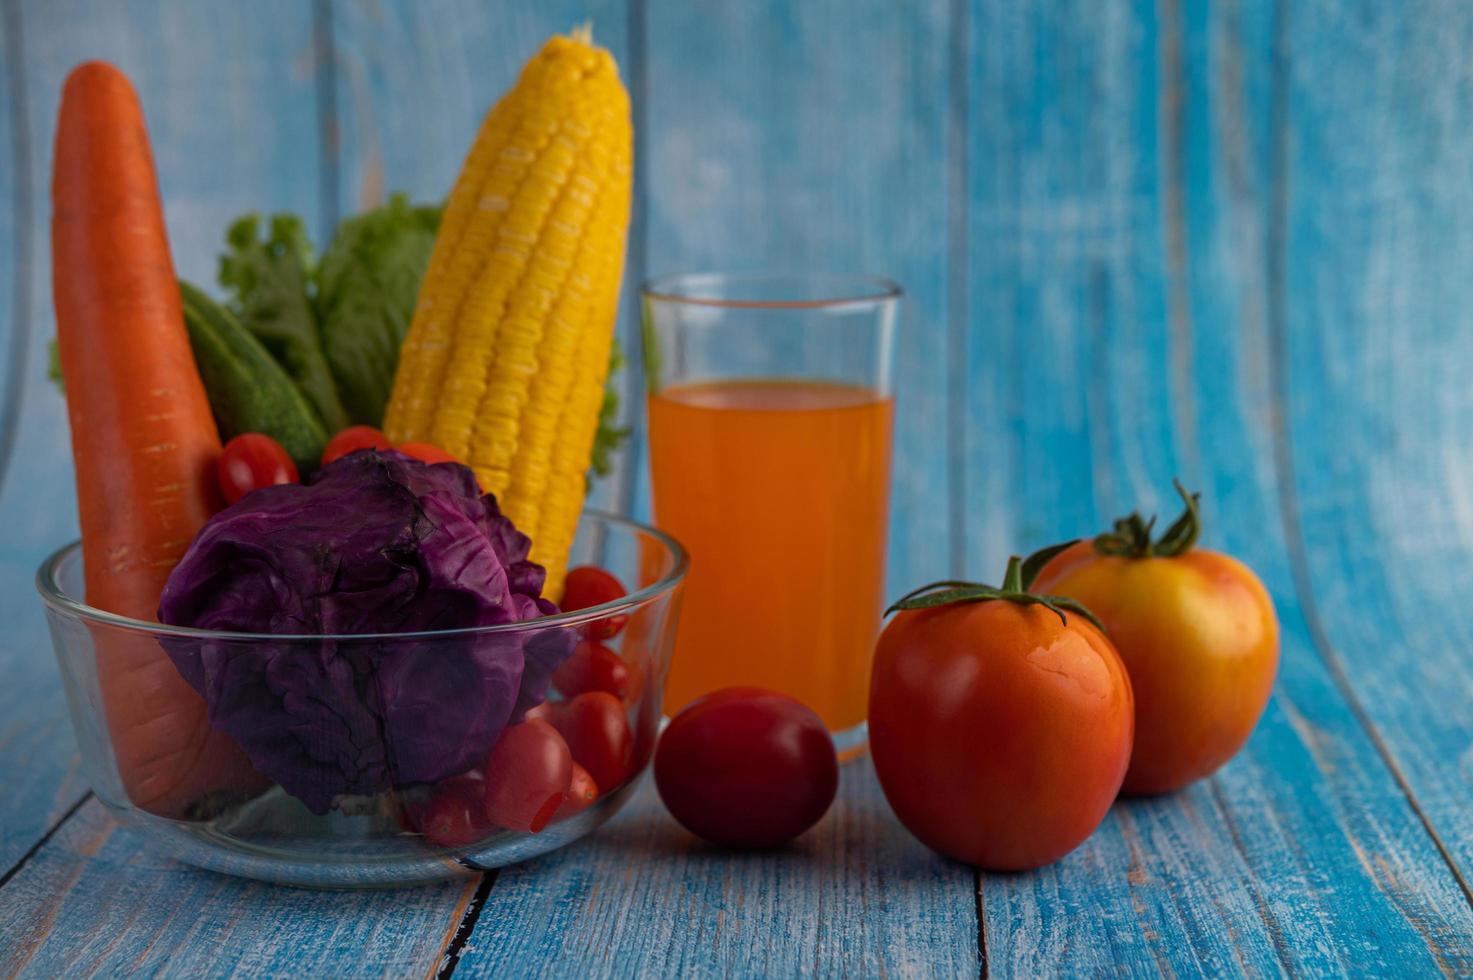 Tomaten, Karotten, Gurken und Purpurkohl foto